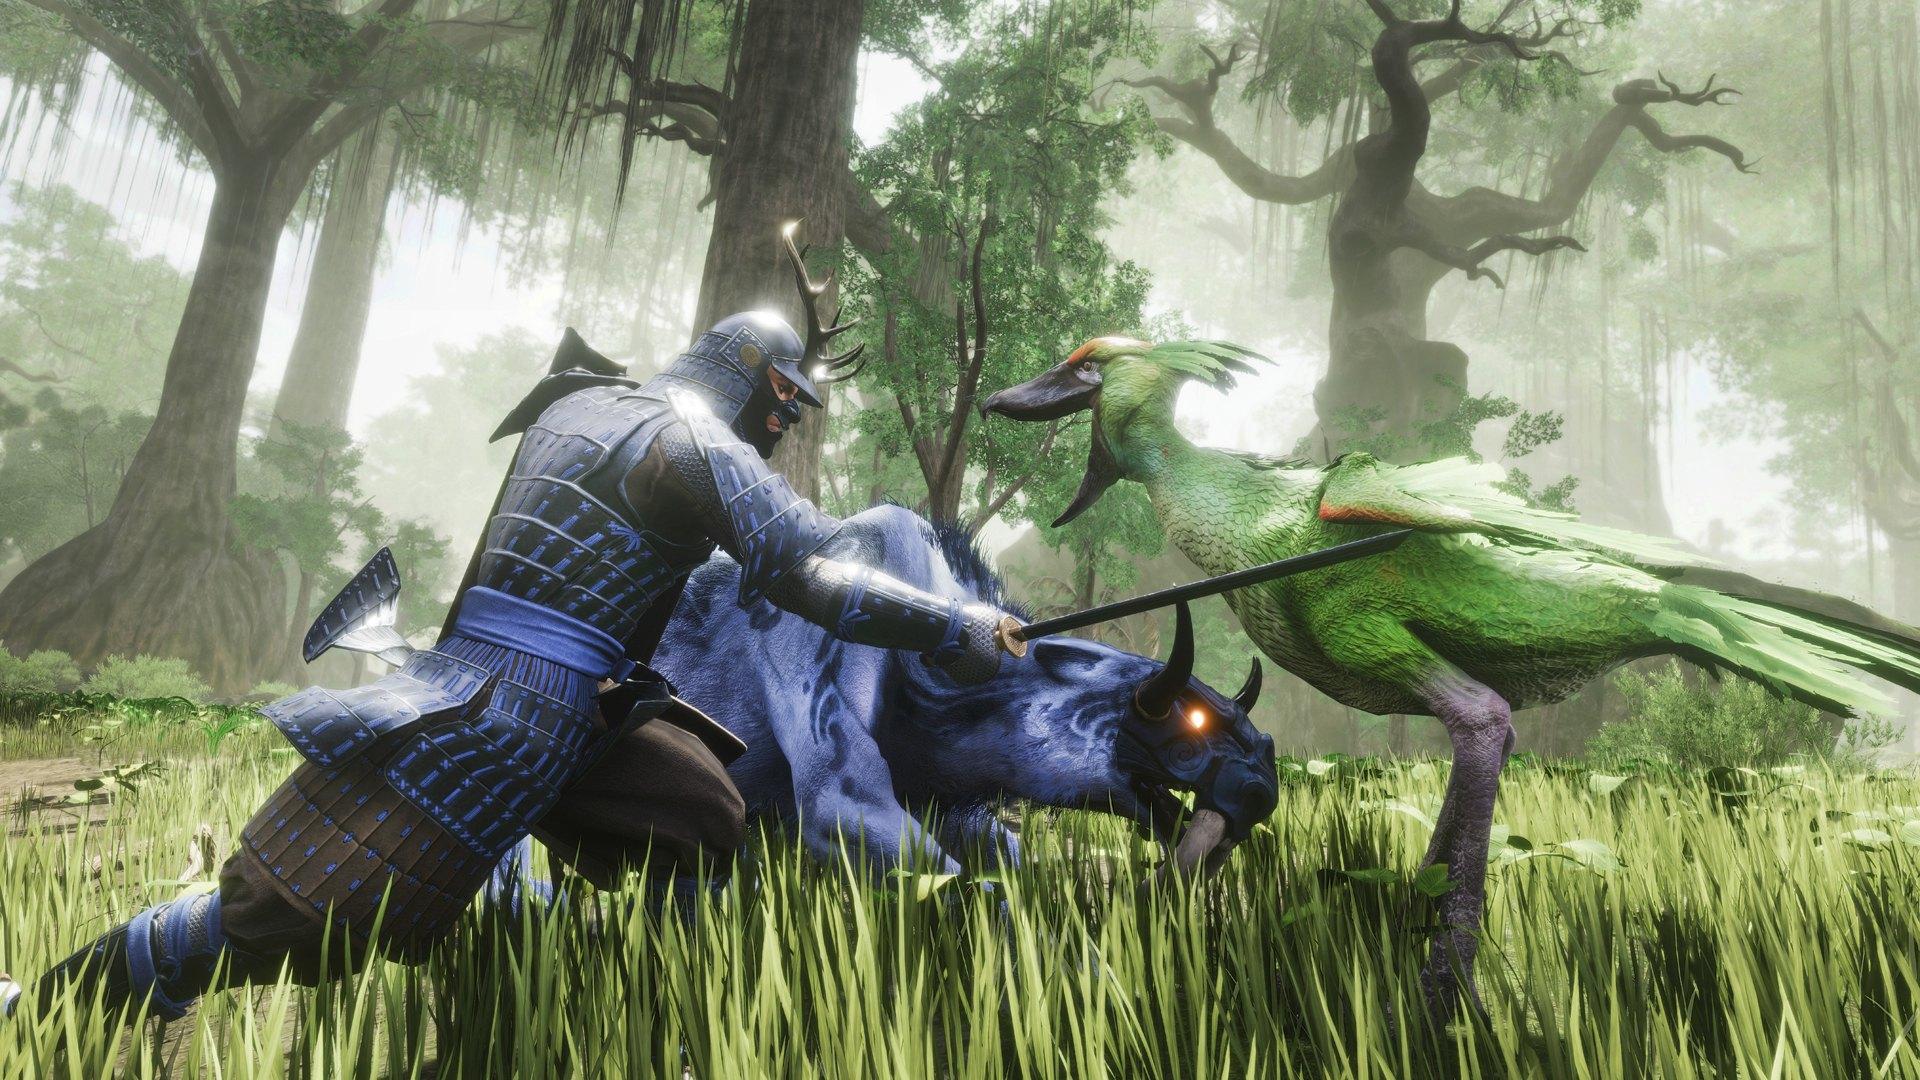 Conan Exiles - Seekers of the Dawn Pack DLC Steam CD Key